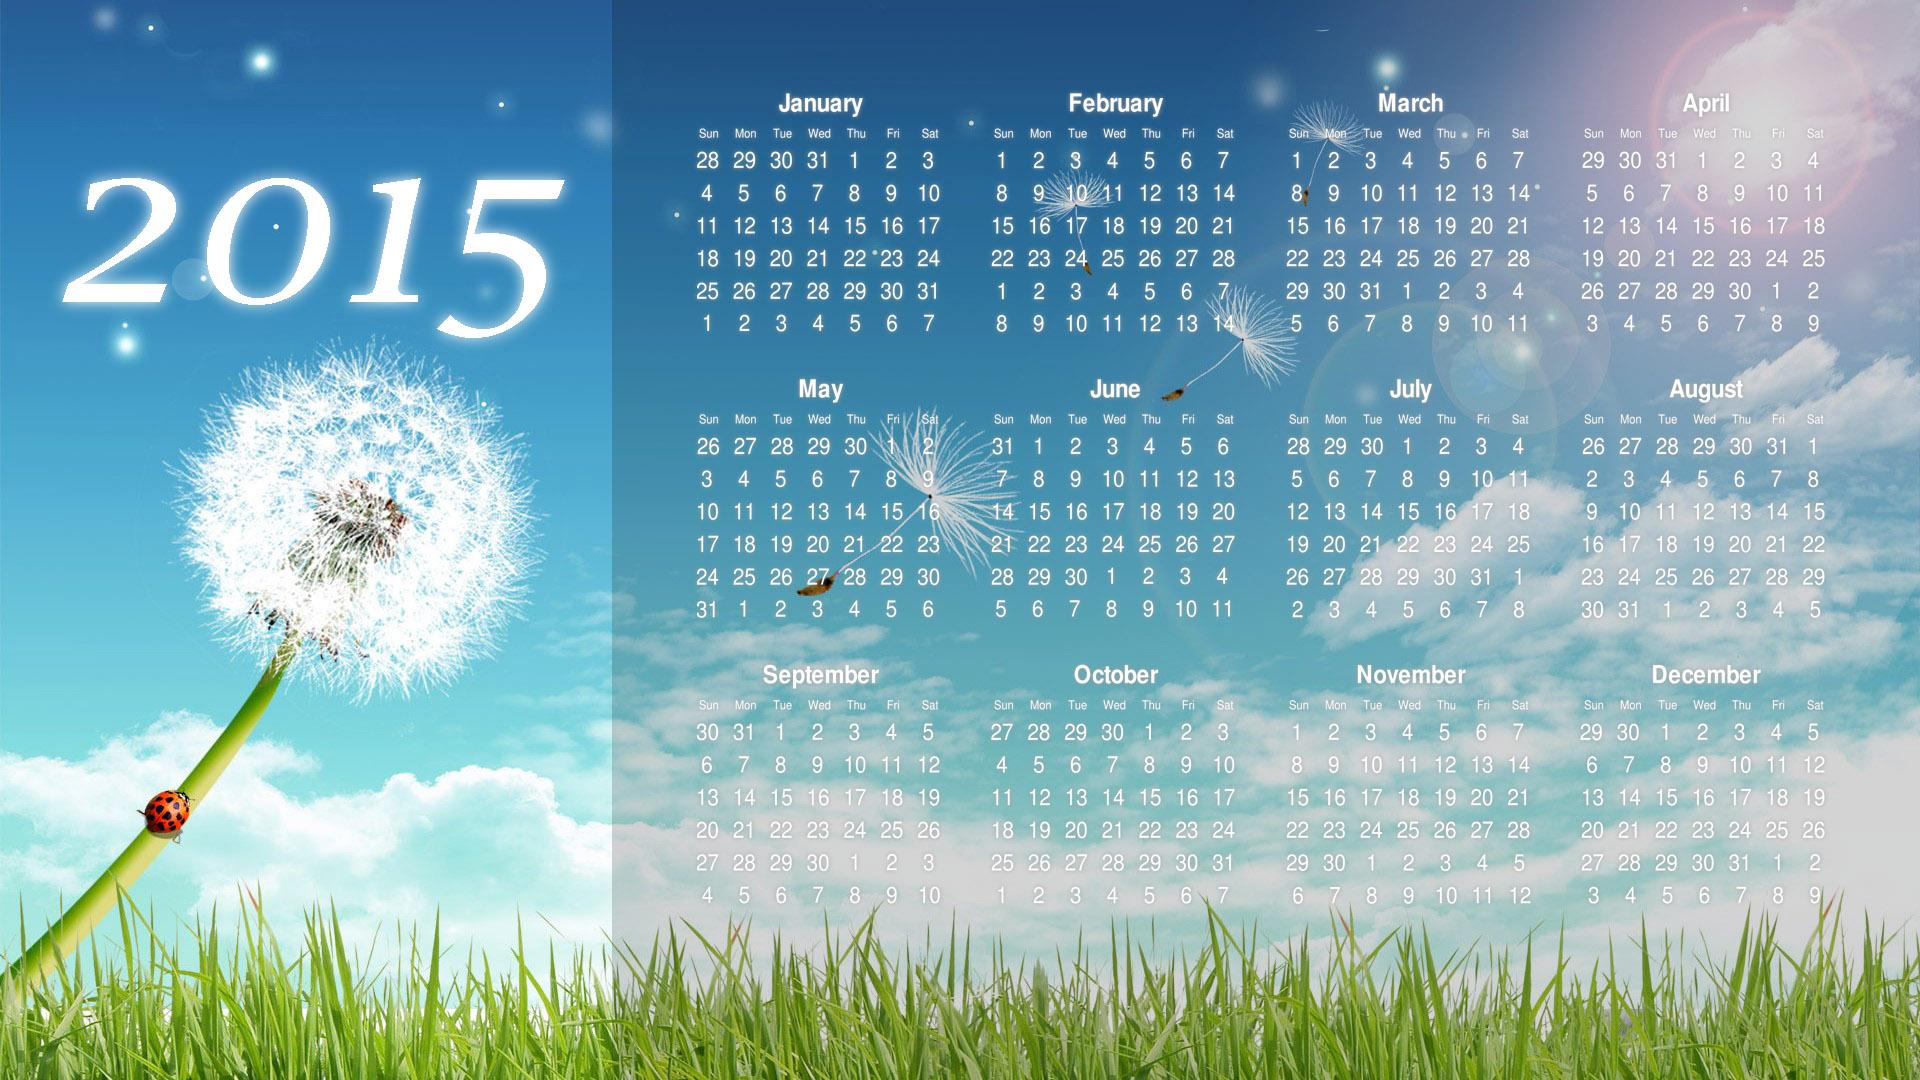 2015 calendar hd wallpapers download free desktop wallpaper images